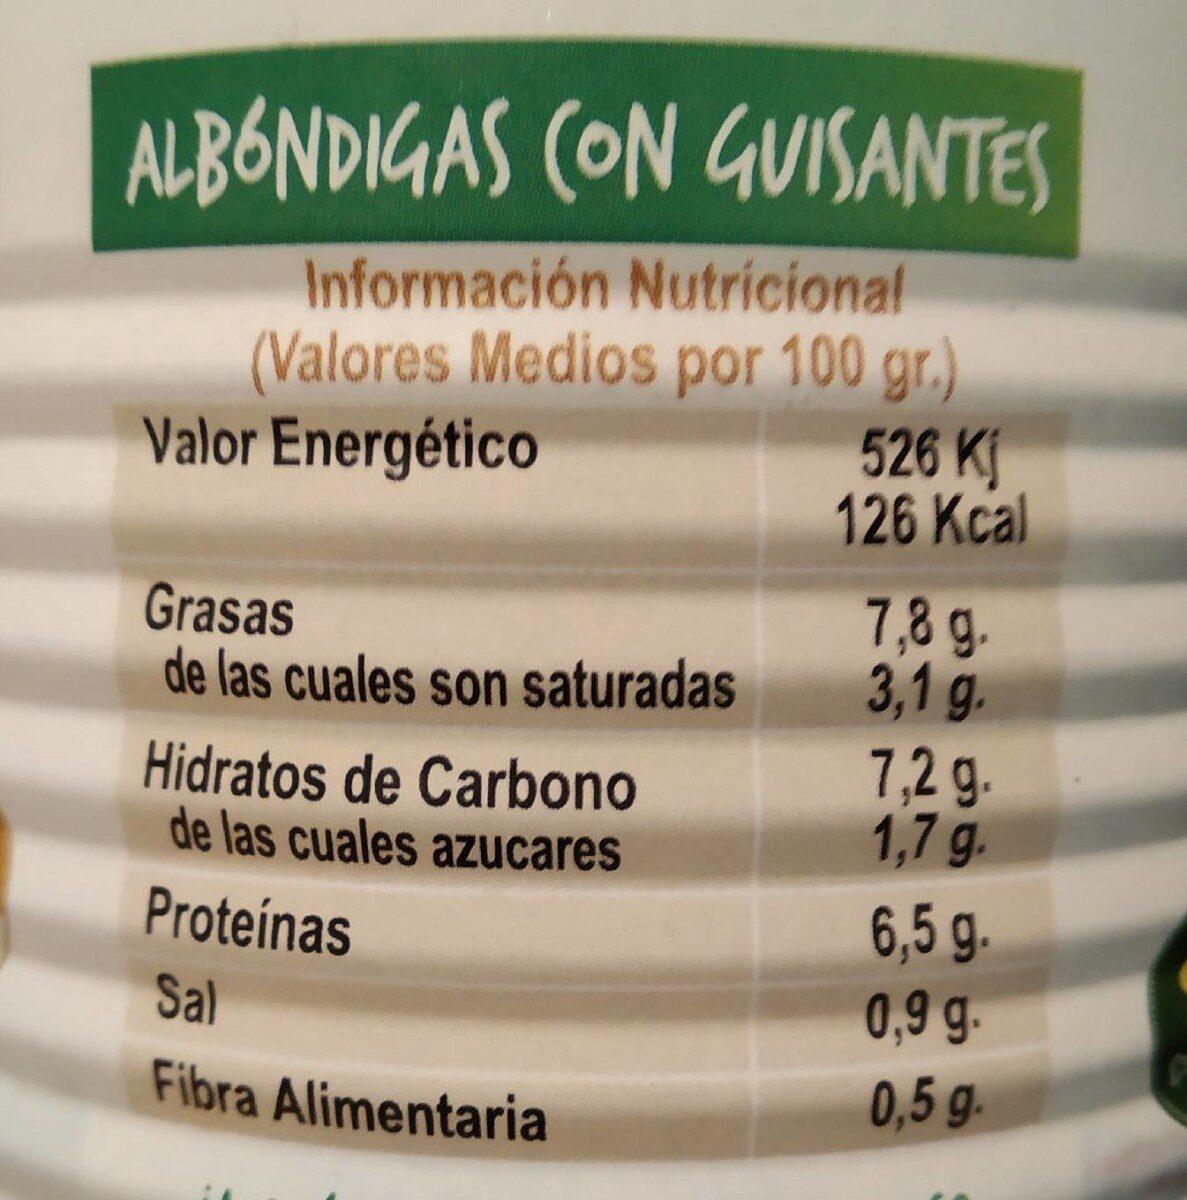 Albondigas con guisantes - Informació nutricional